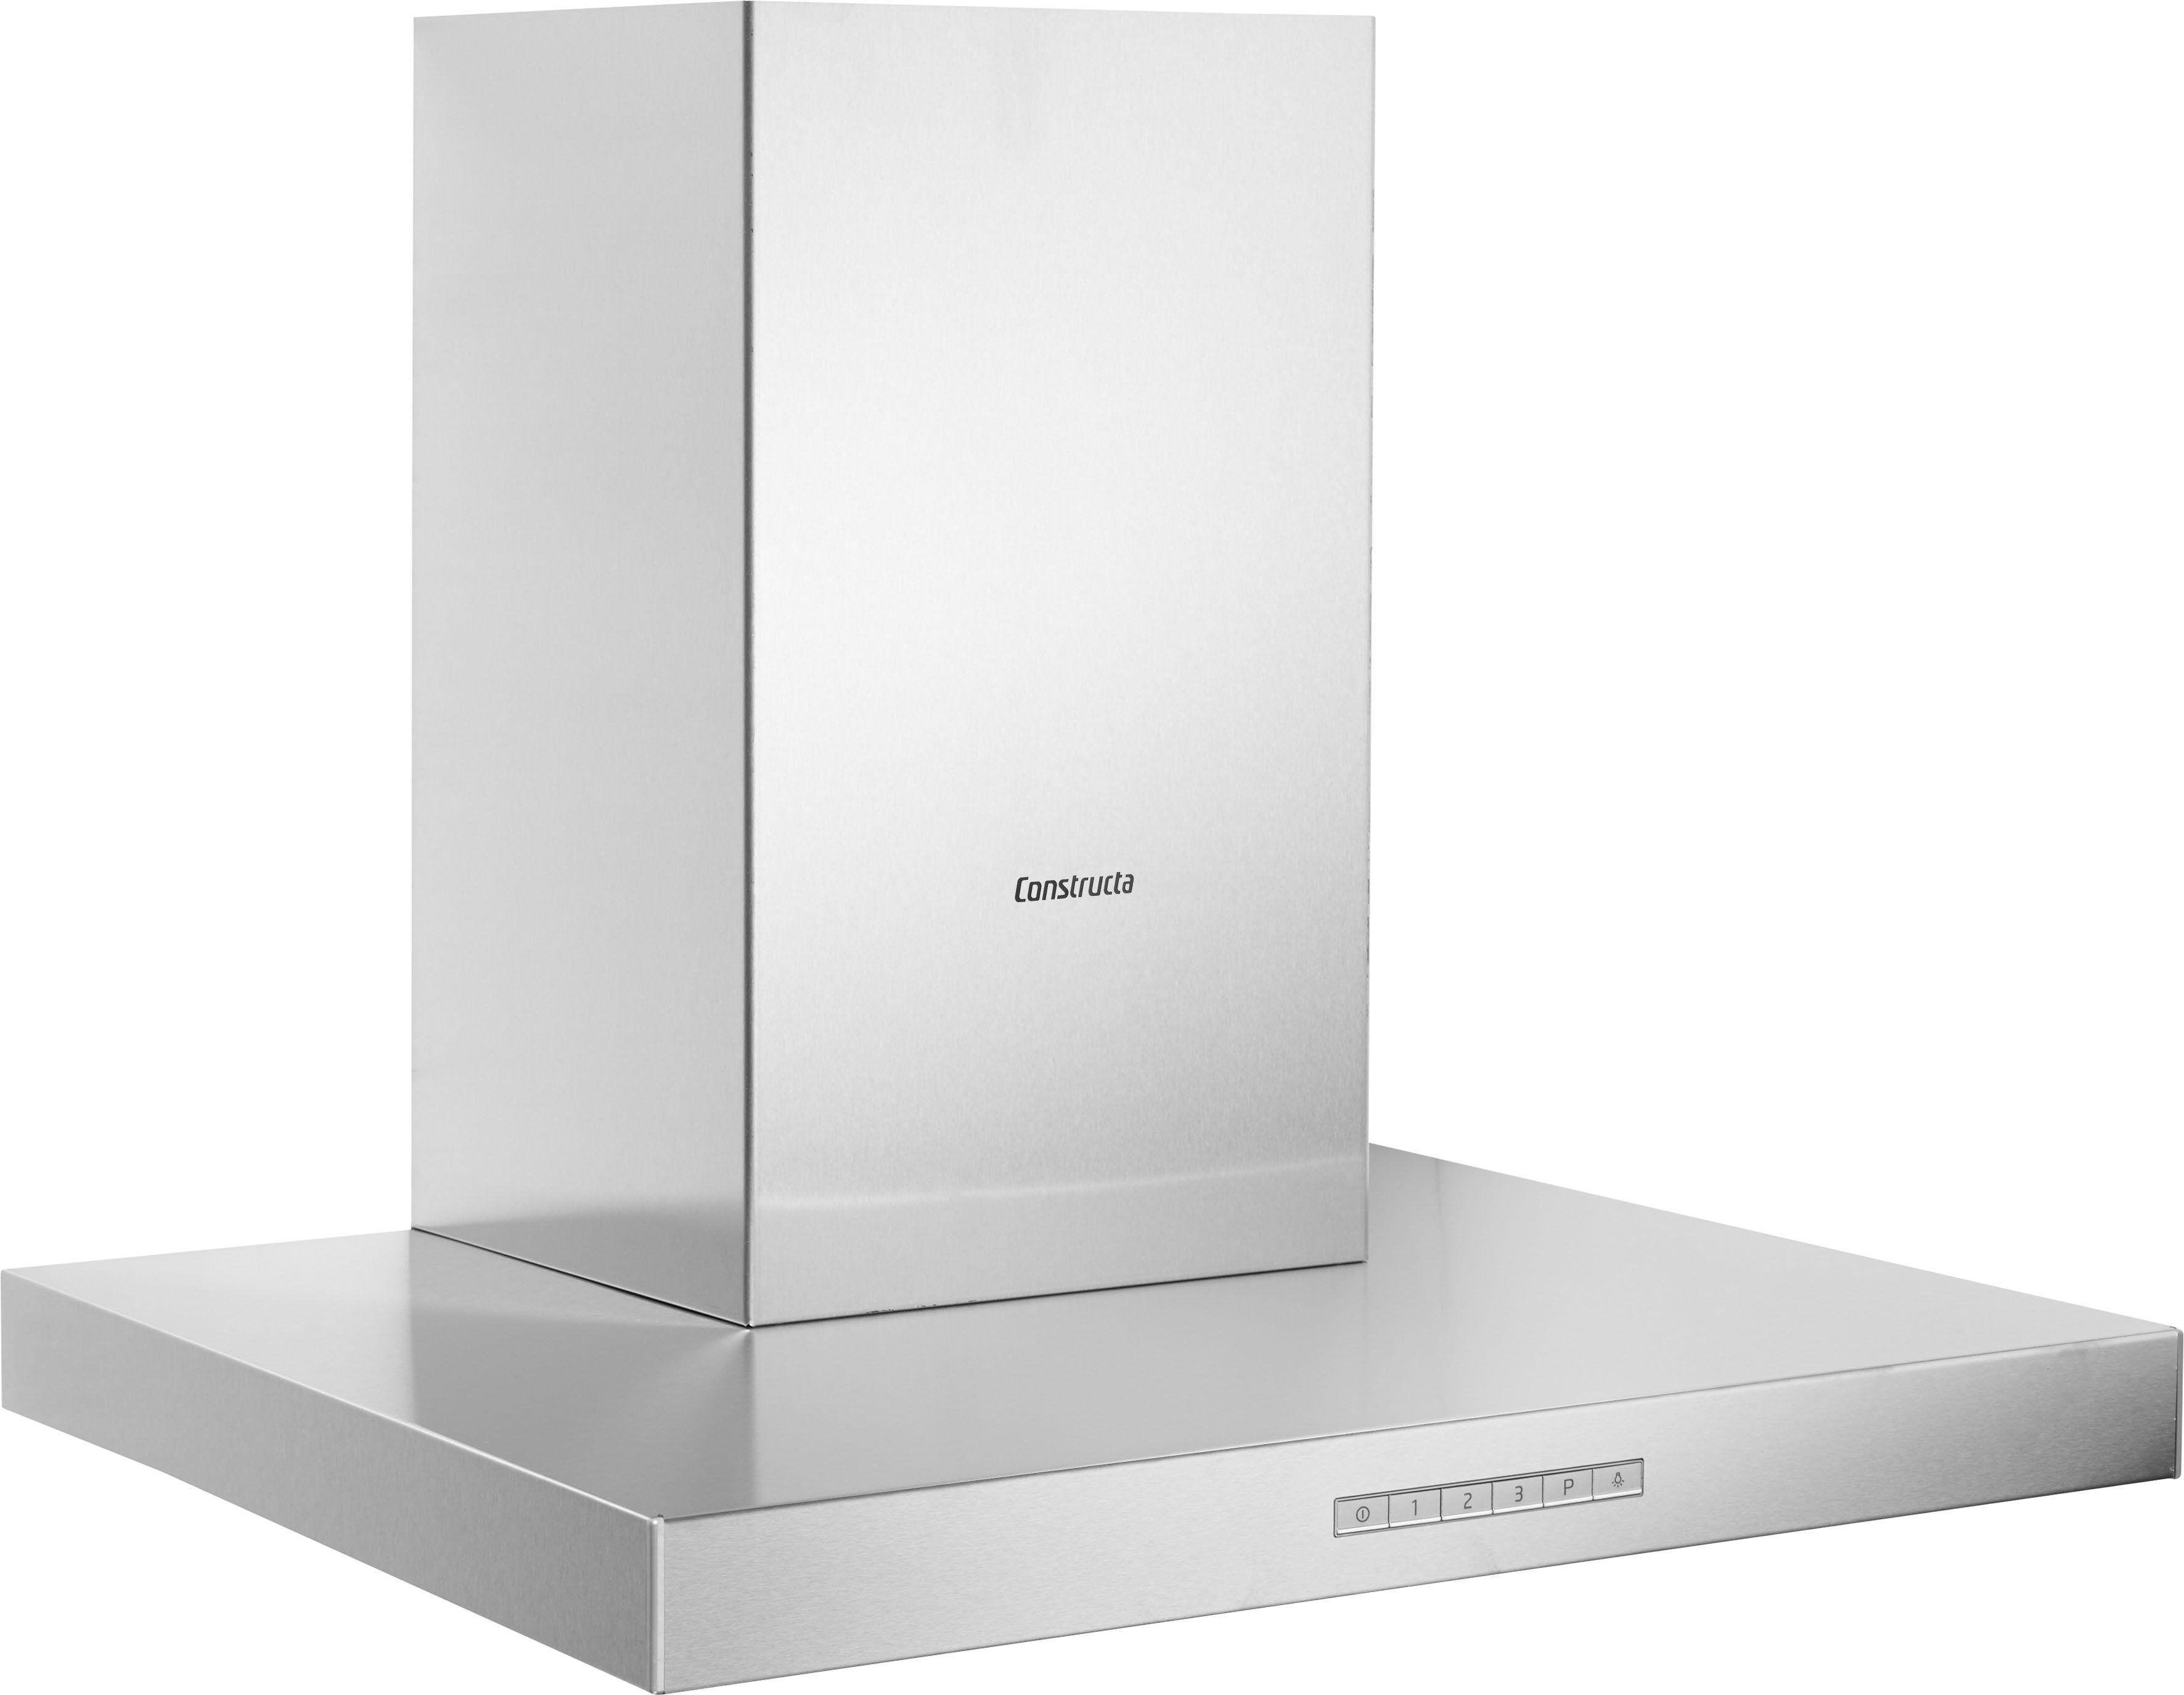 Constructa Wandhaube CD636253, Energieeffizienzklasse A